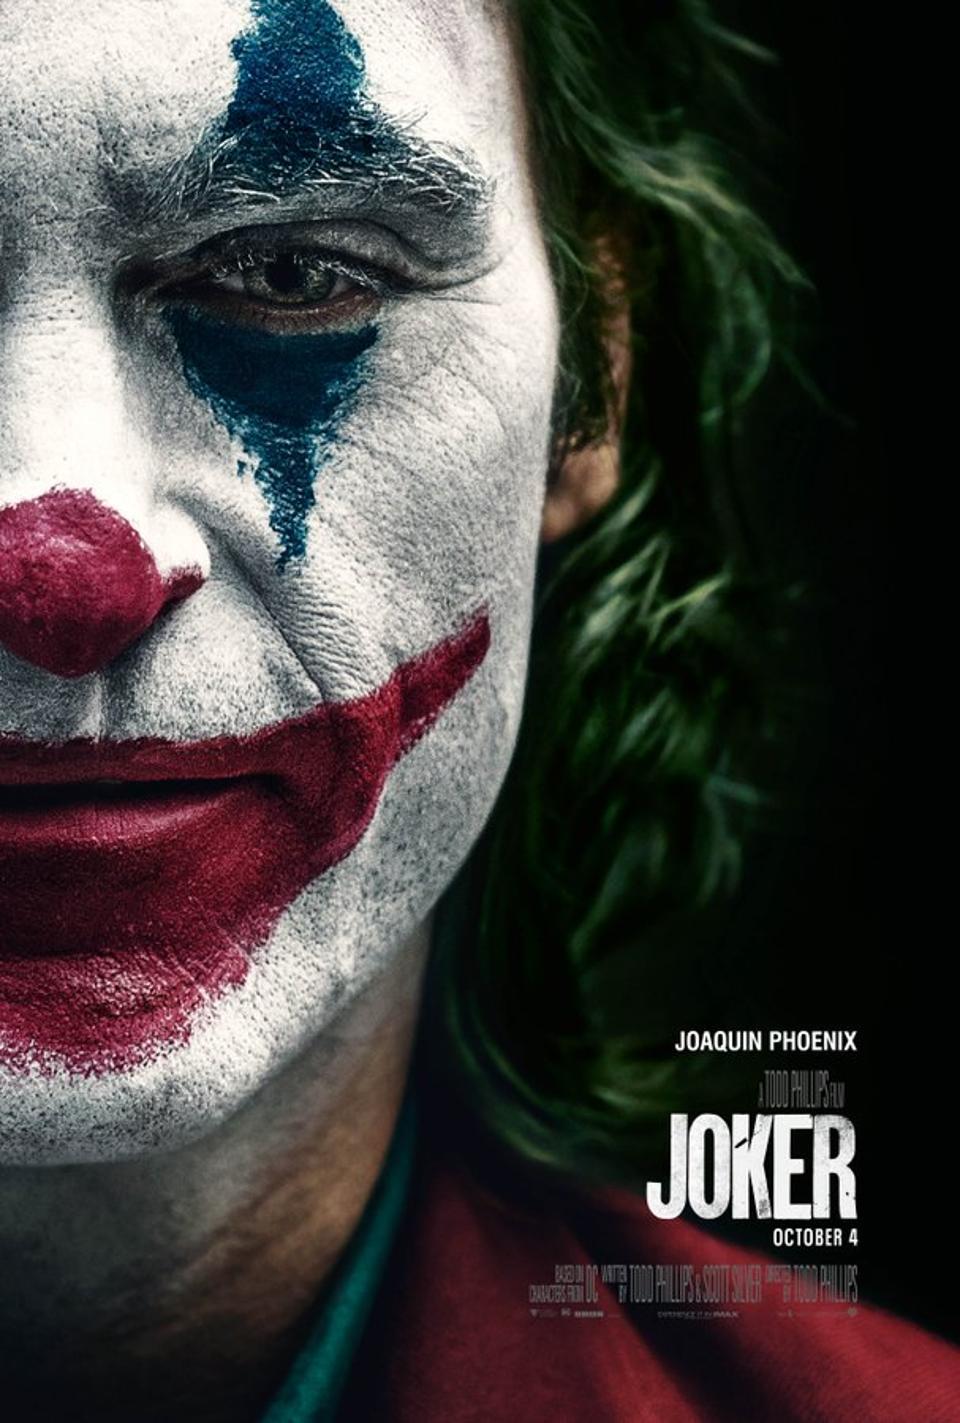 Ver Joker Hd Descargar Joker 2019 Película Completa En Espanol Onju Chan